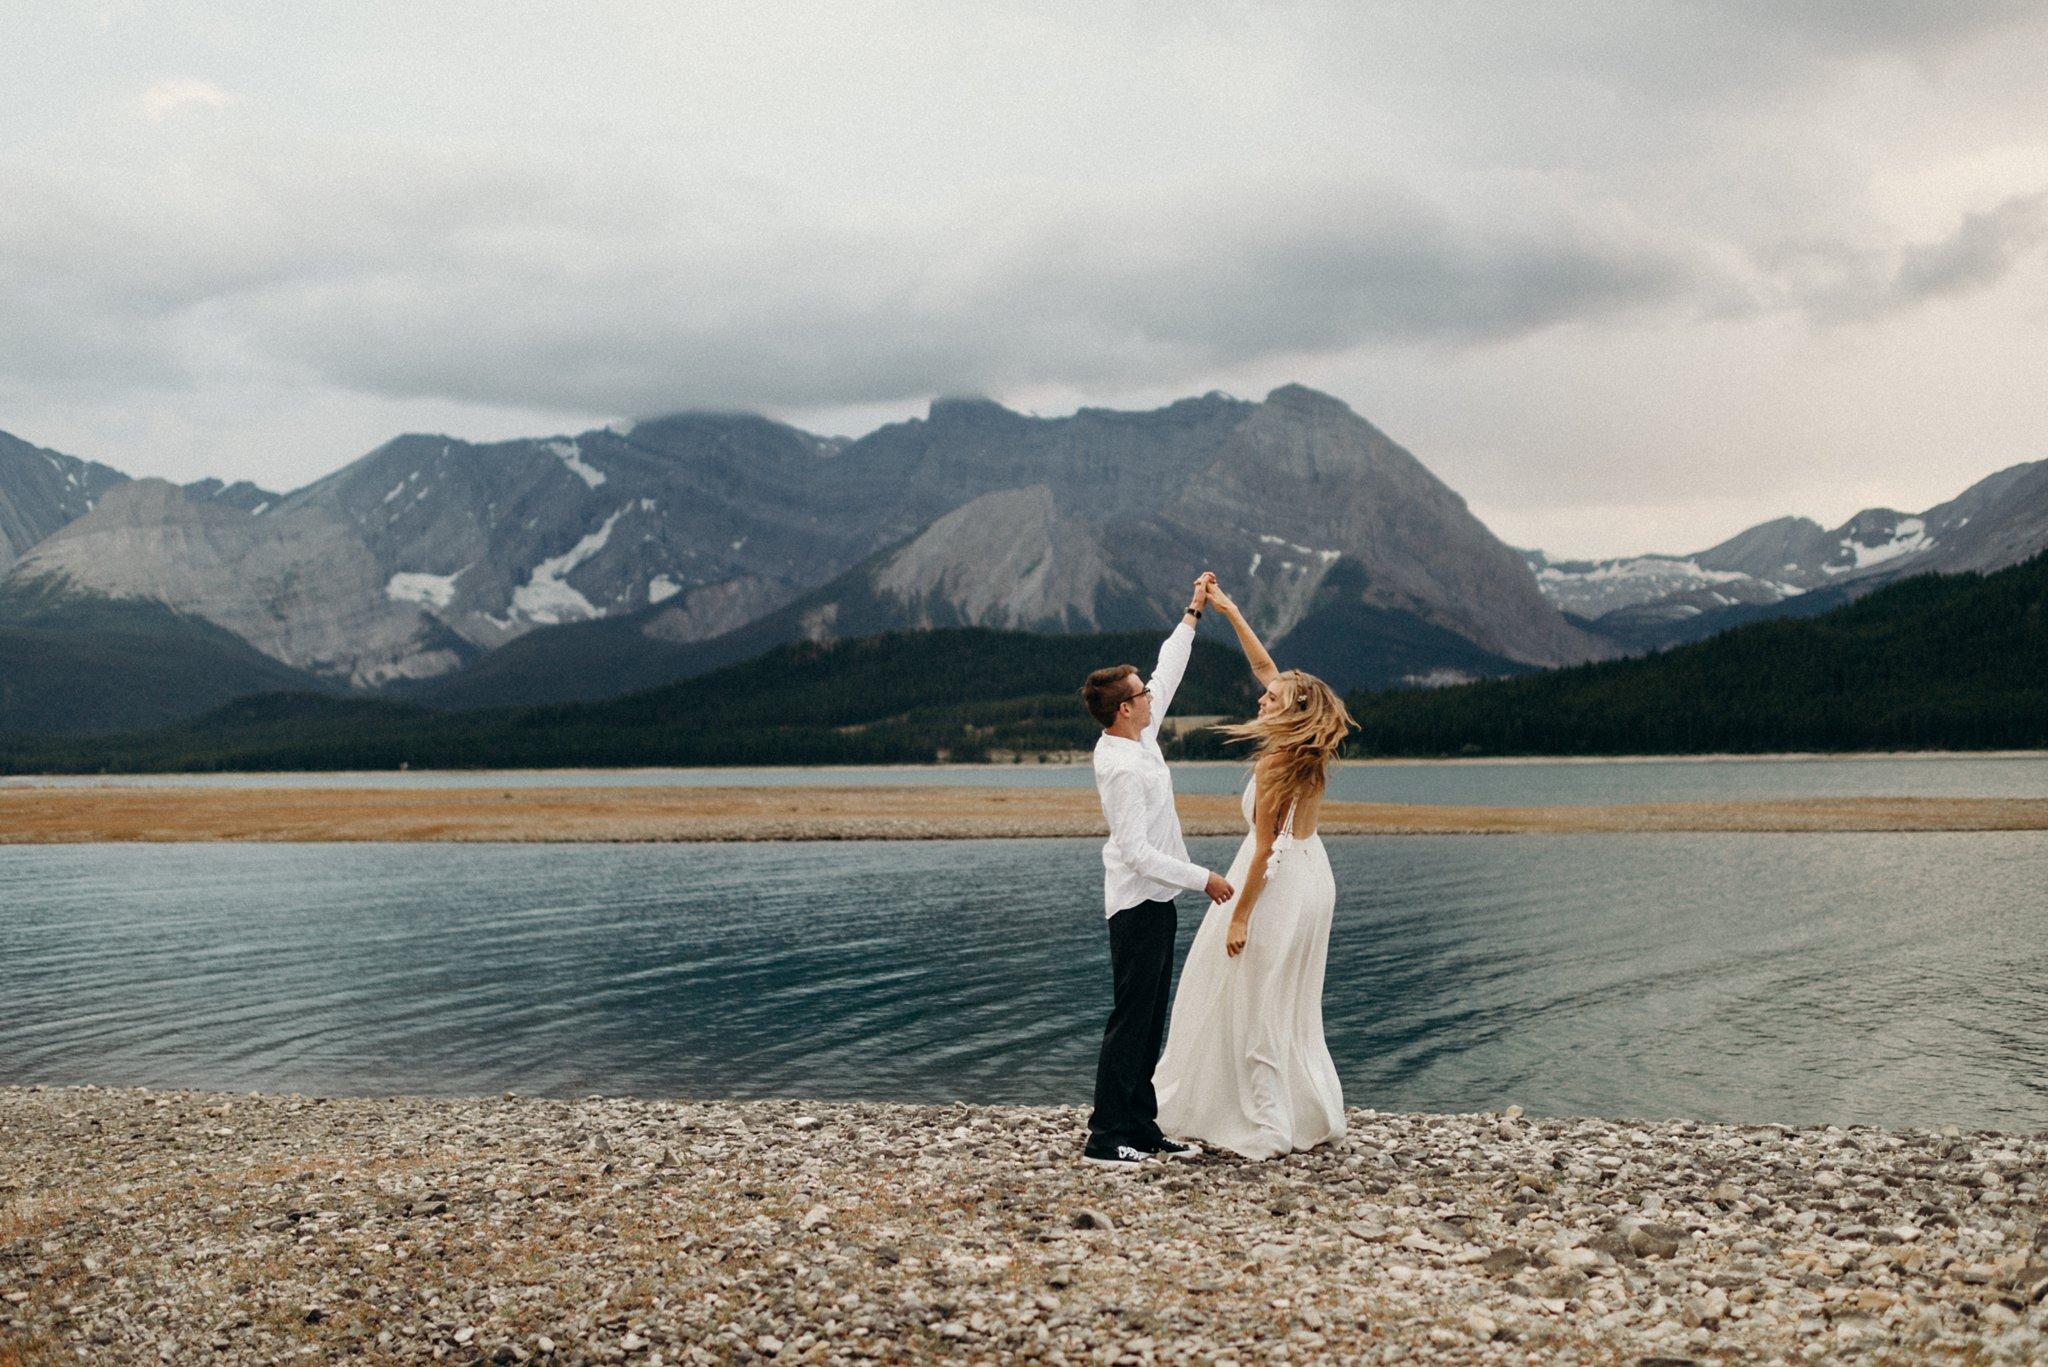 kaihla_tonai_intimate_wedding_elopement_photographer_6444.jpg